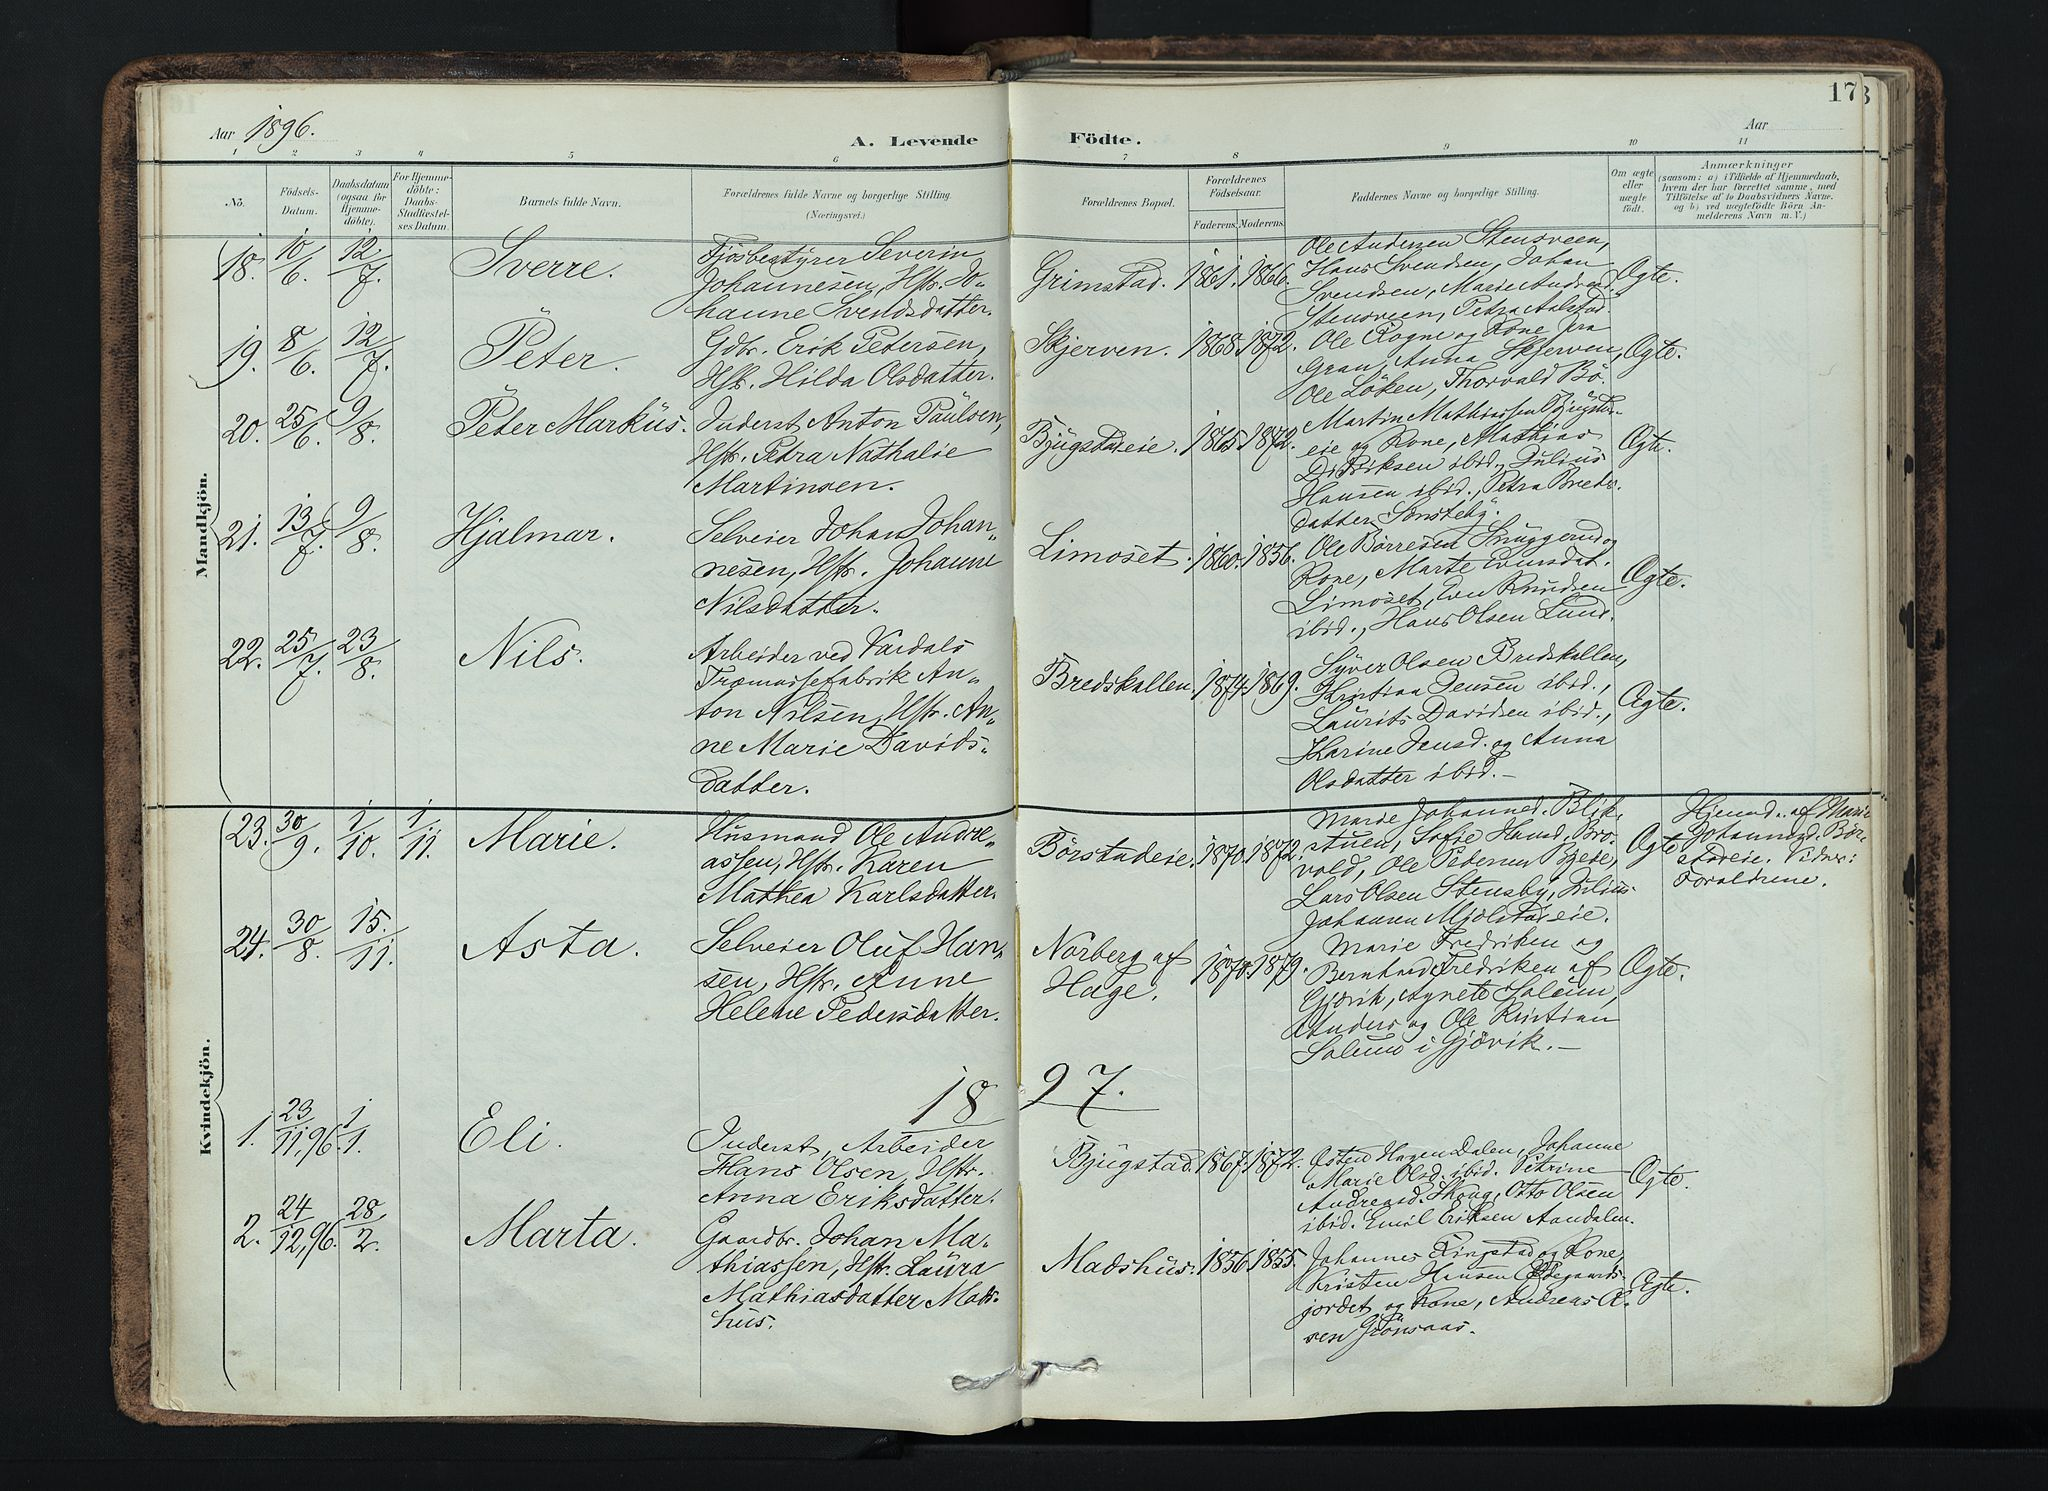 SAH, Vardal prestekontor, H/Ha/Haa/L0019: Ministerialbok nr. 19, 1893-1907, s. 17